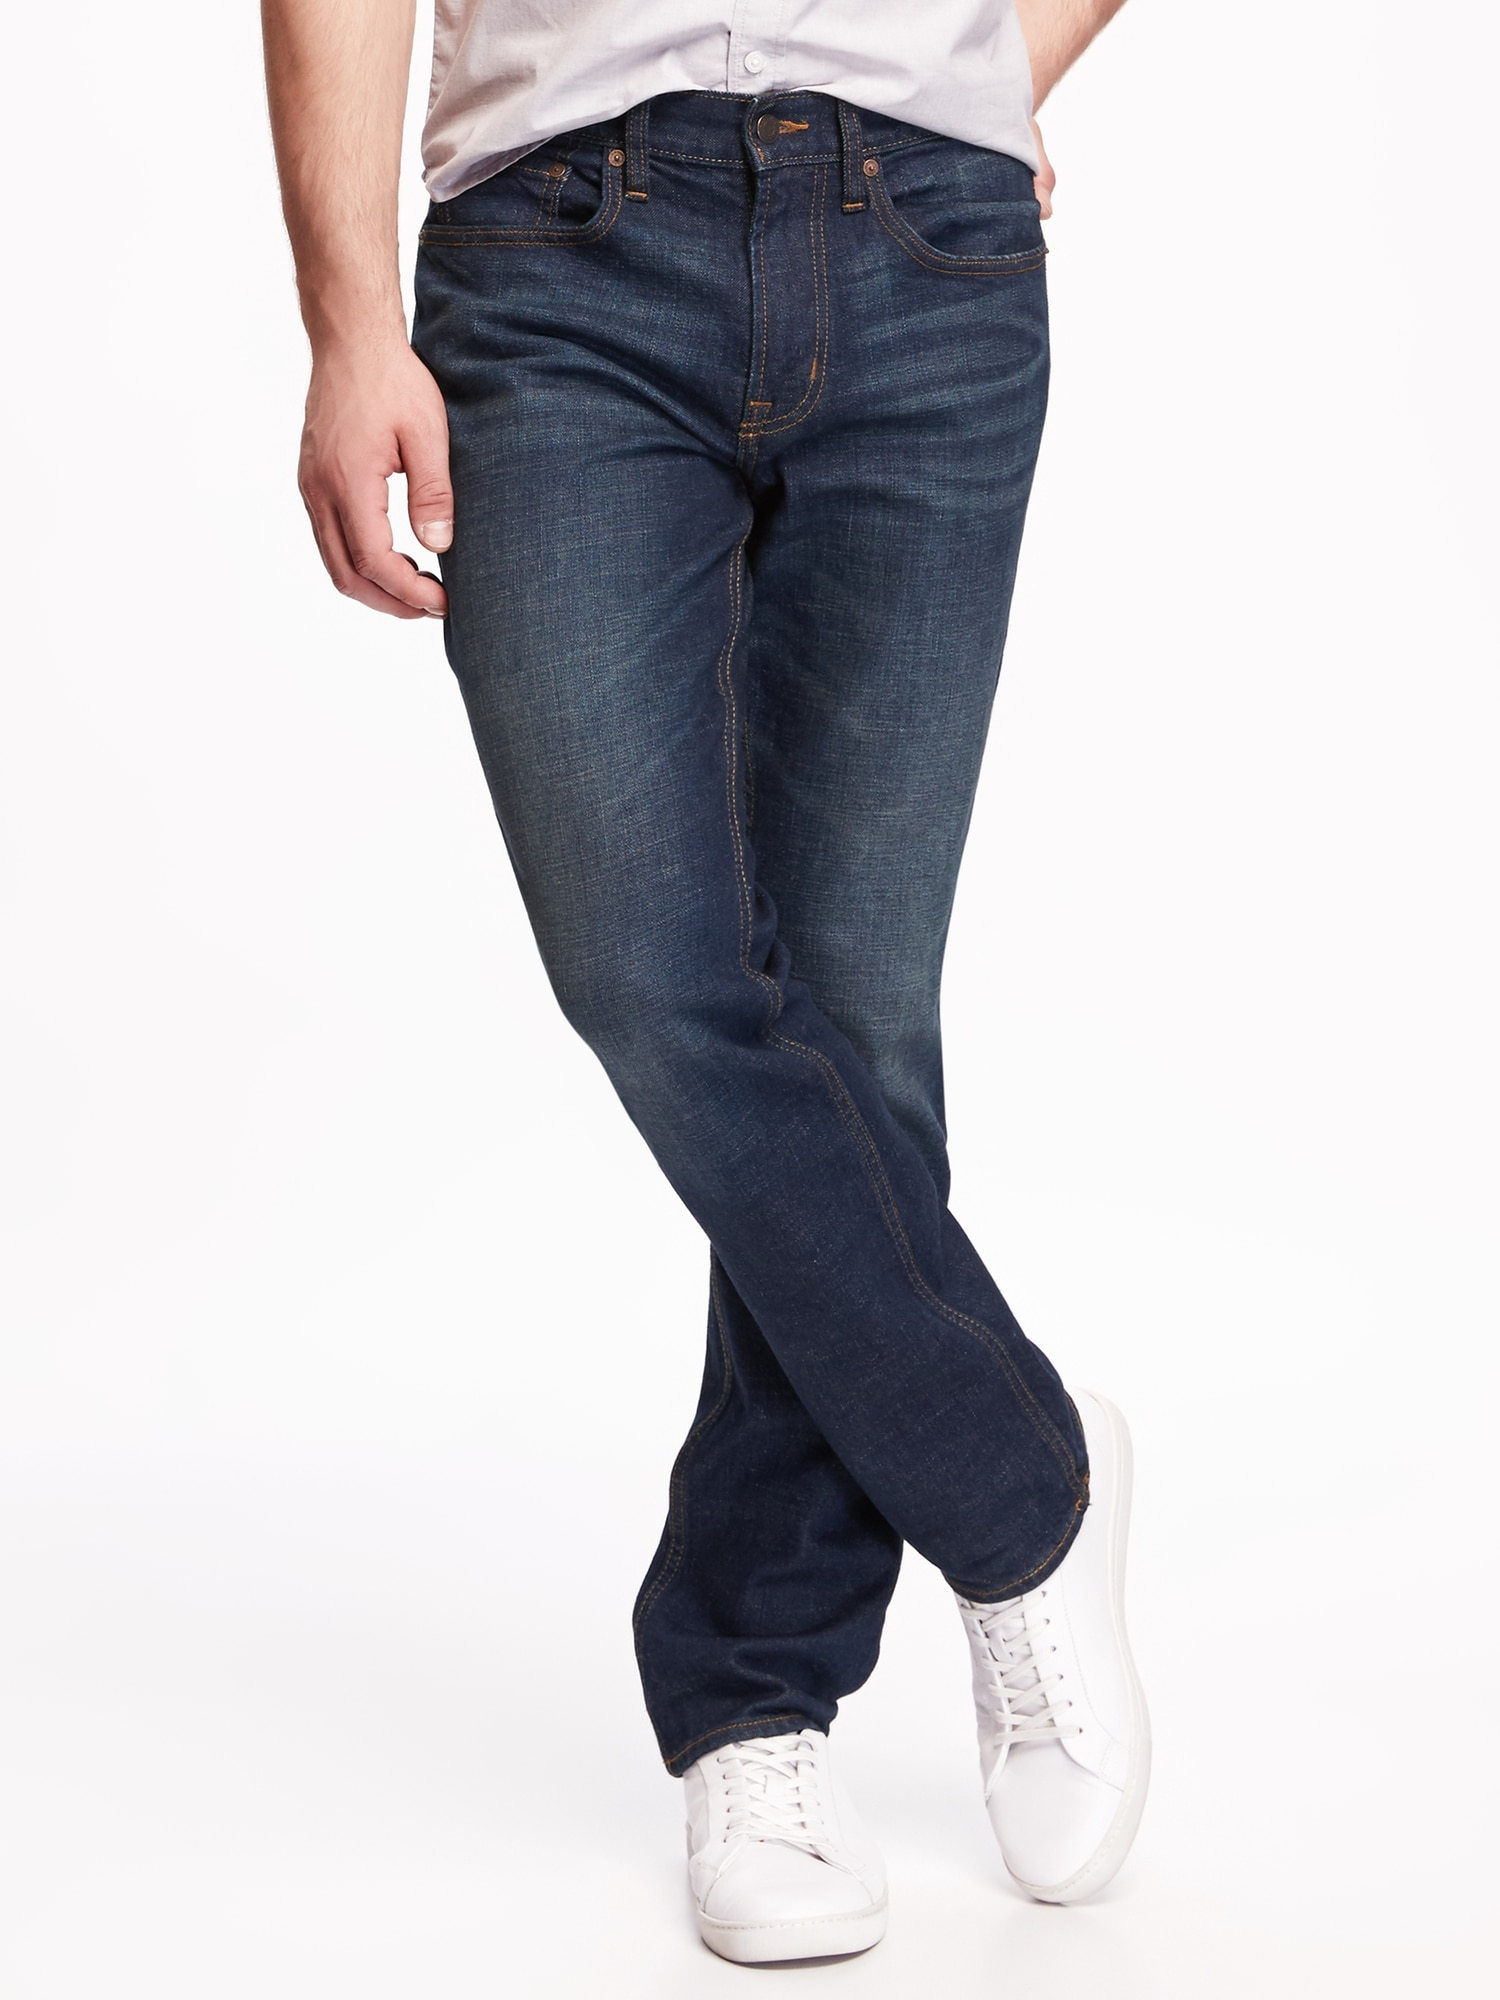 e31997678a Slim Built-In-Flex Jeans for Men | Old Navy